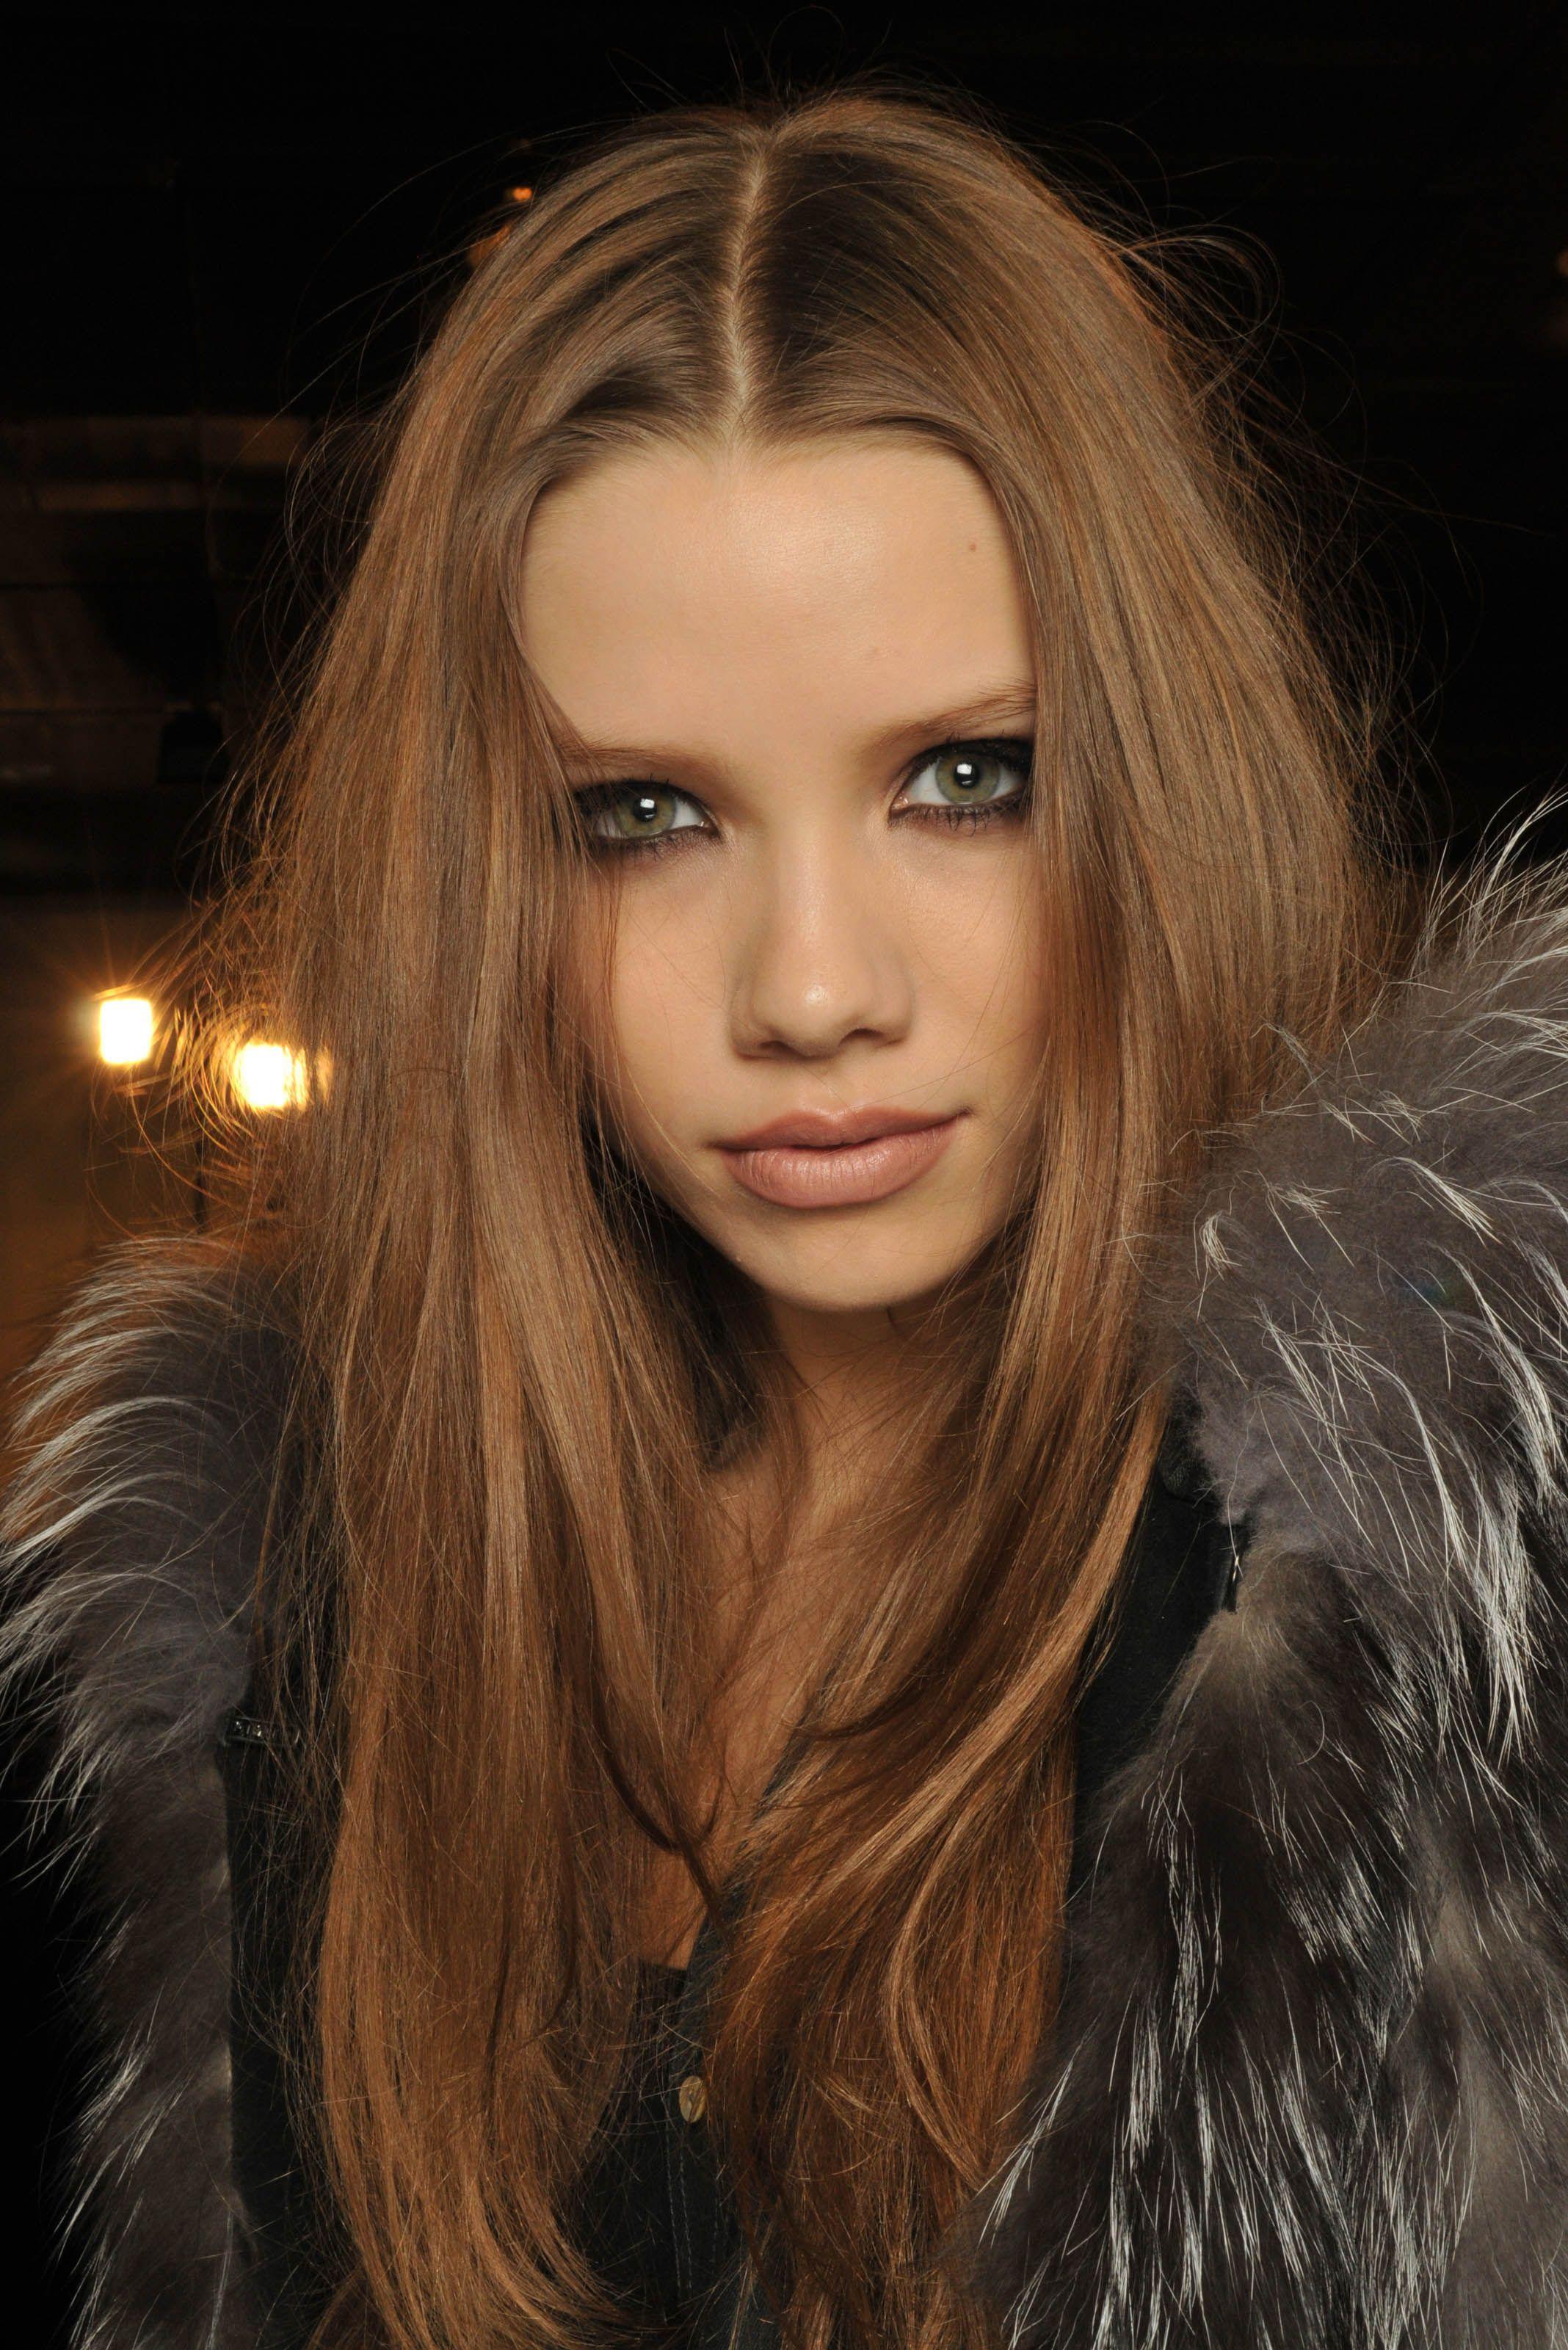 Anastasia Krivosheeva Hair Makeup Pinterest Hair Makeup And